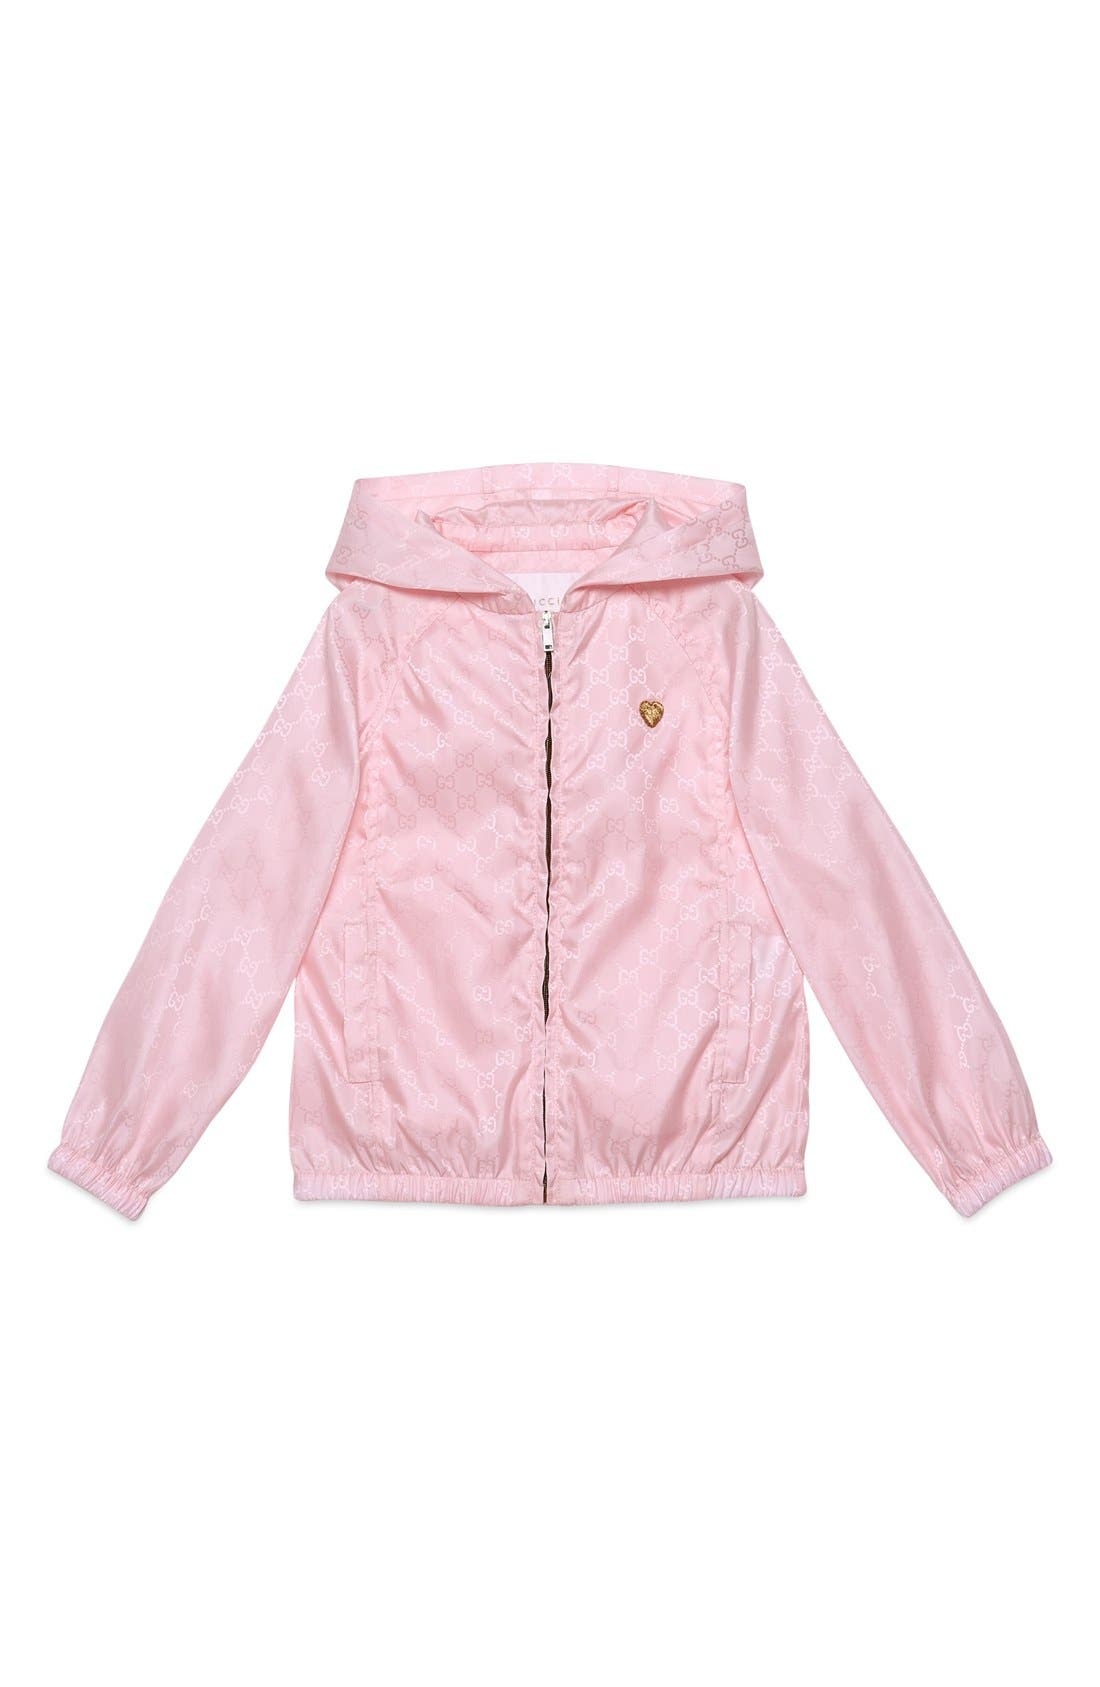 GUCCI Logo Jacquard Nylon Jacket